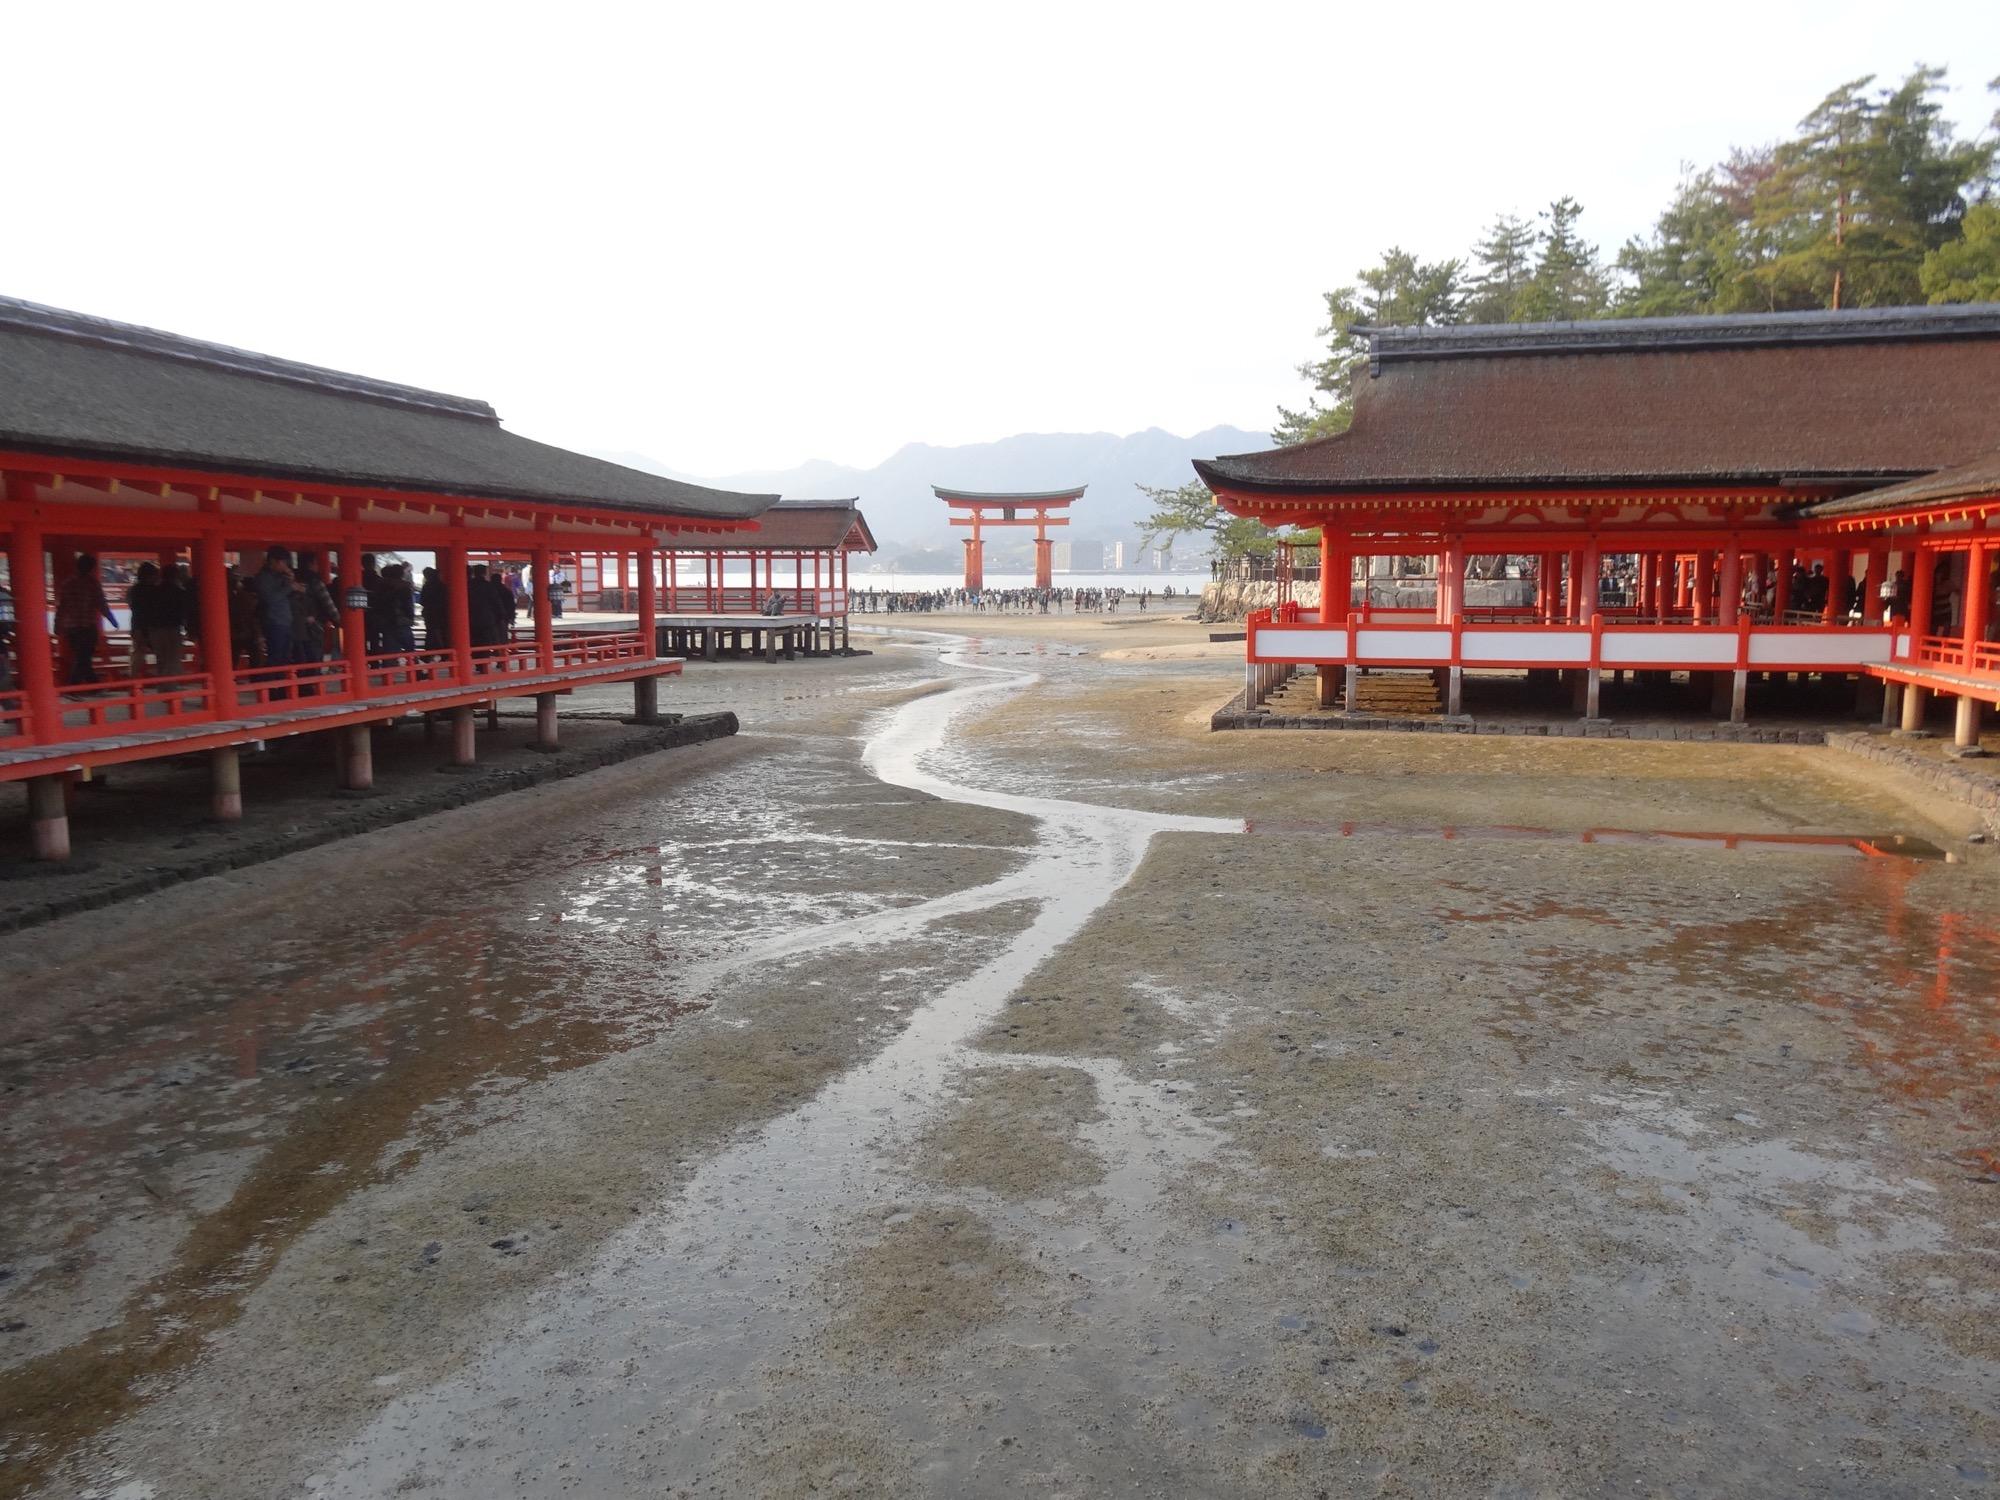 Torii gate at Itsukushima shrine